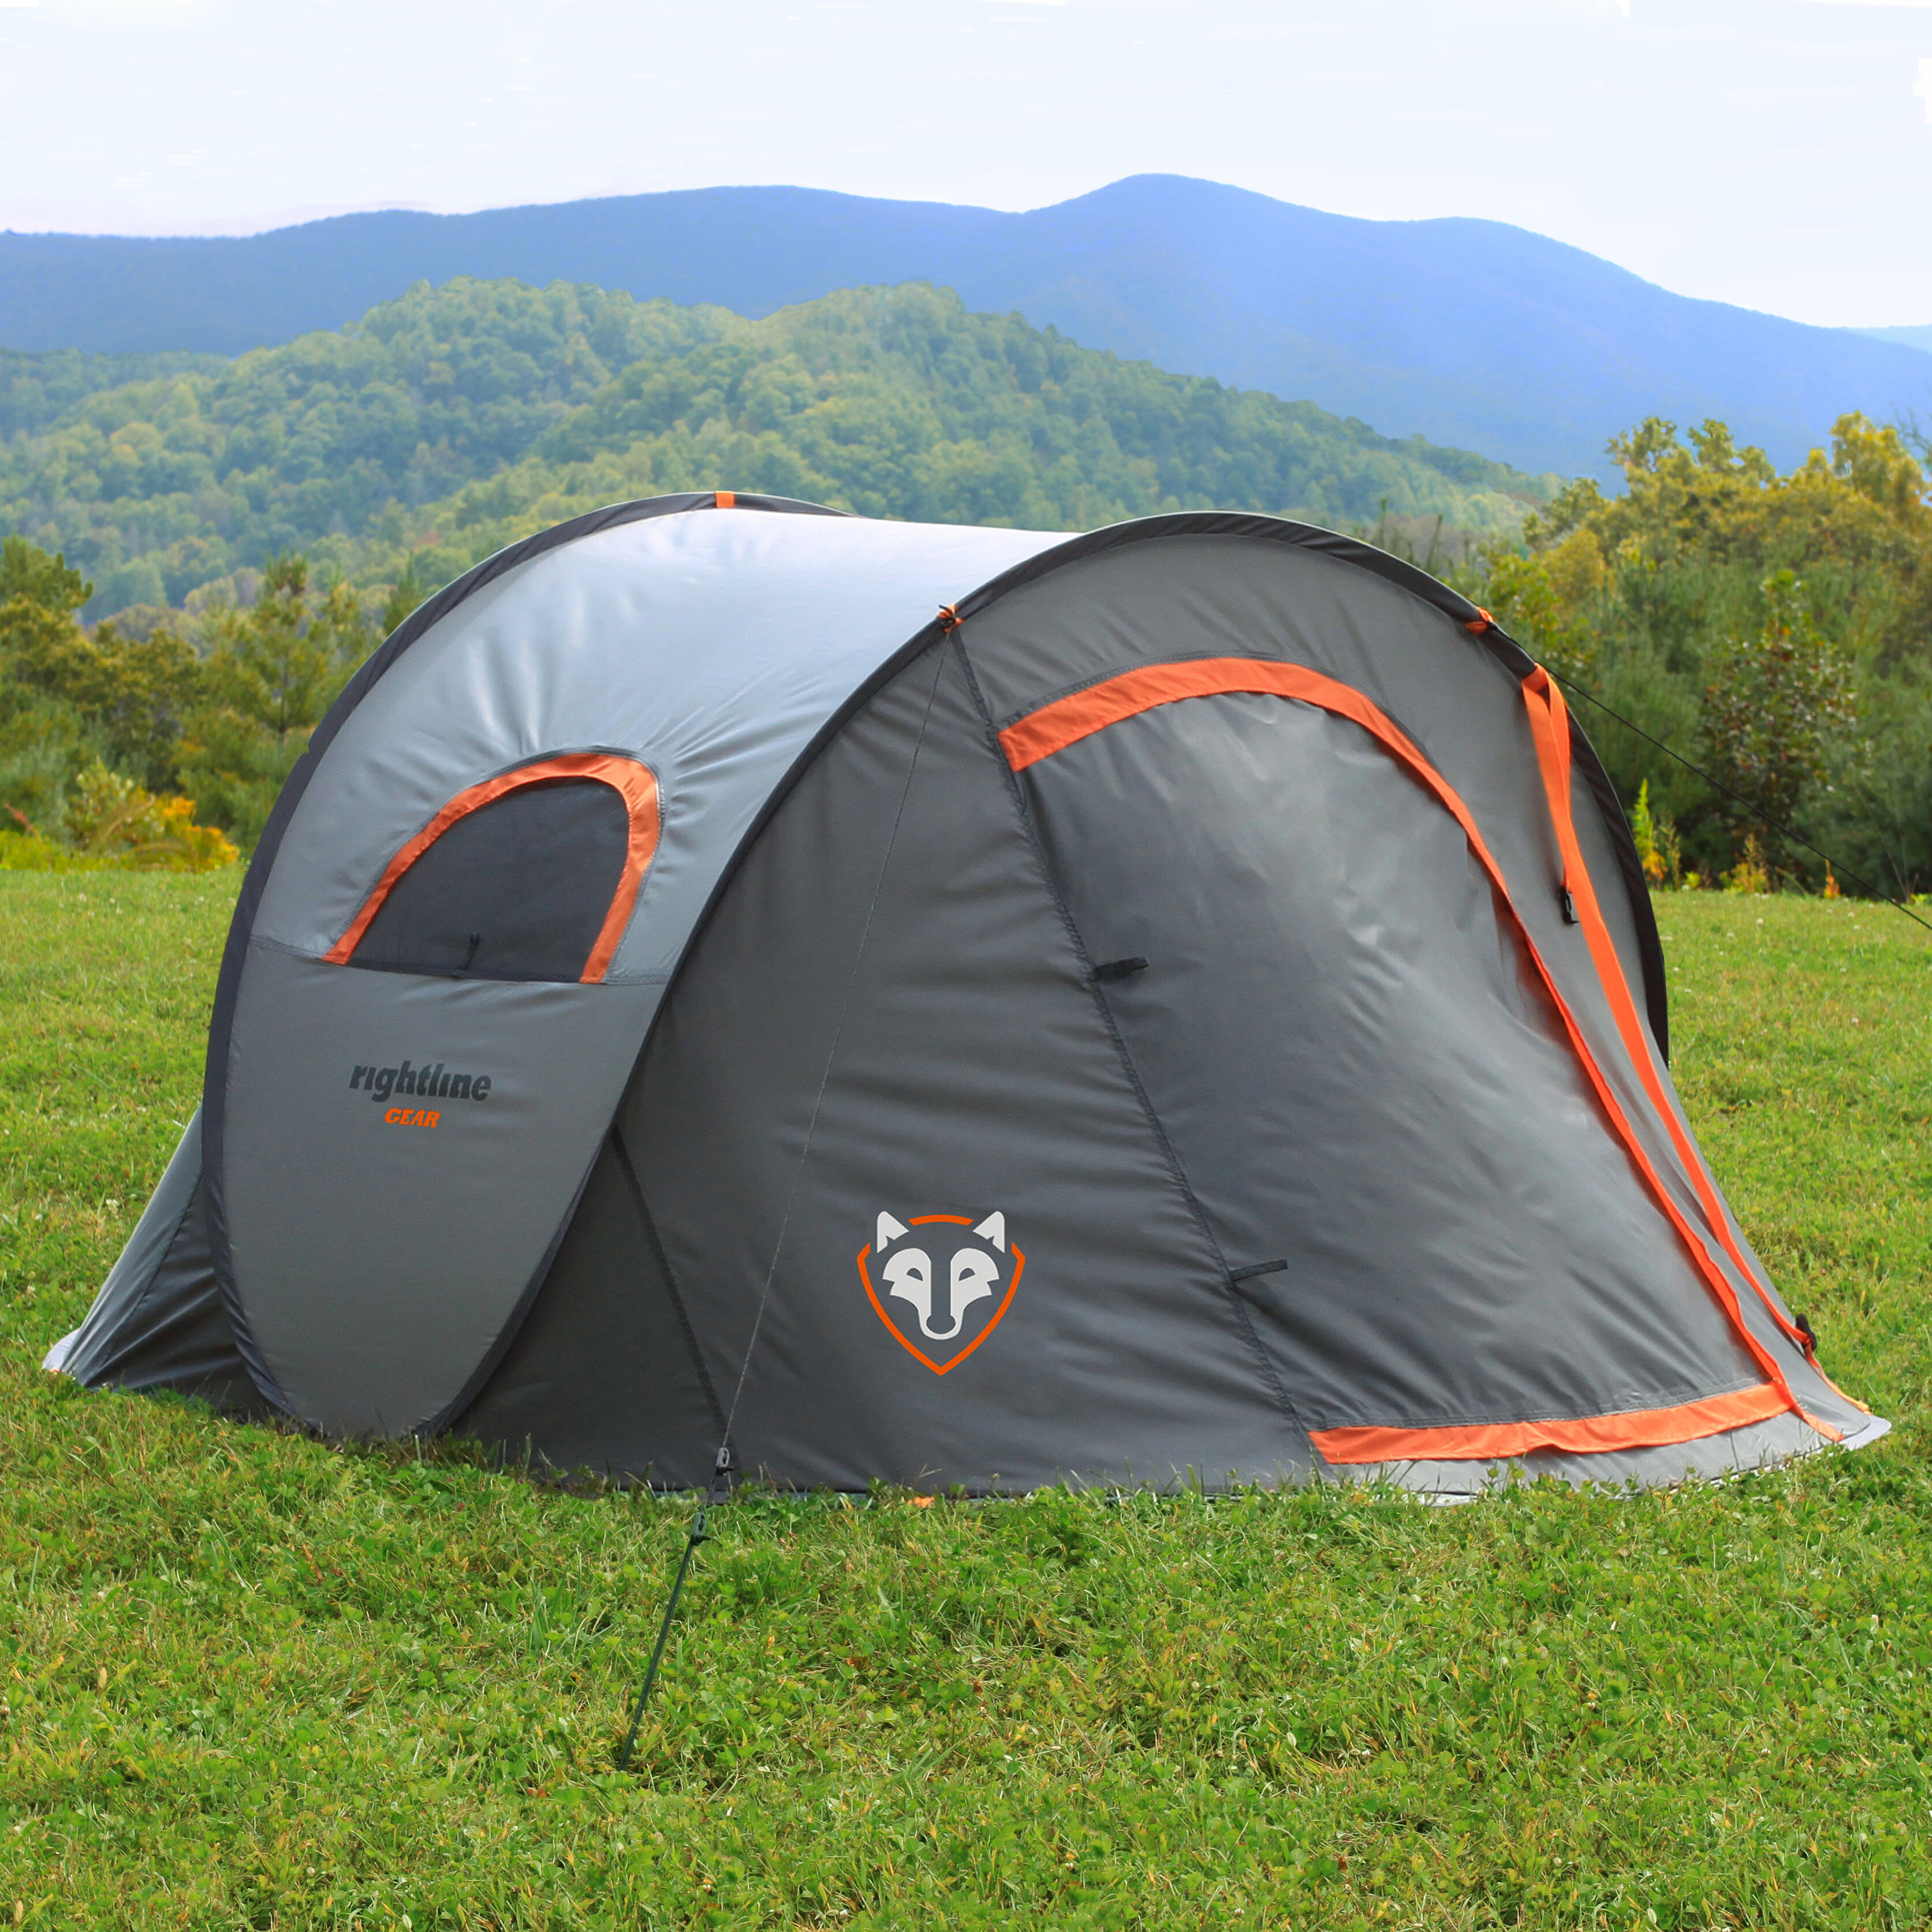 & Rightline Gear Pop Up Tent u0026 Reviews | Wayfair